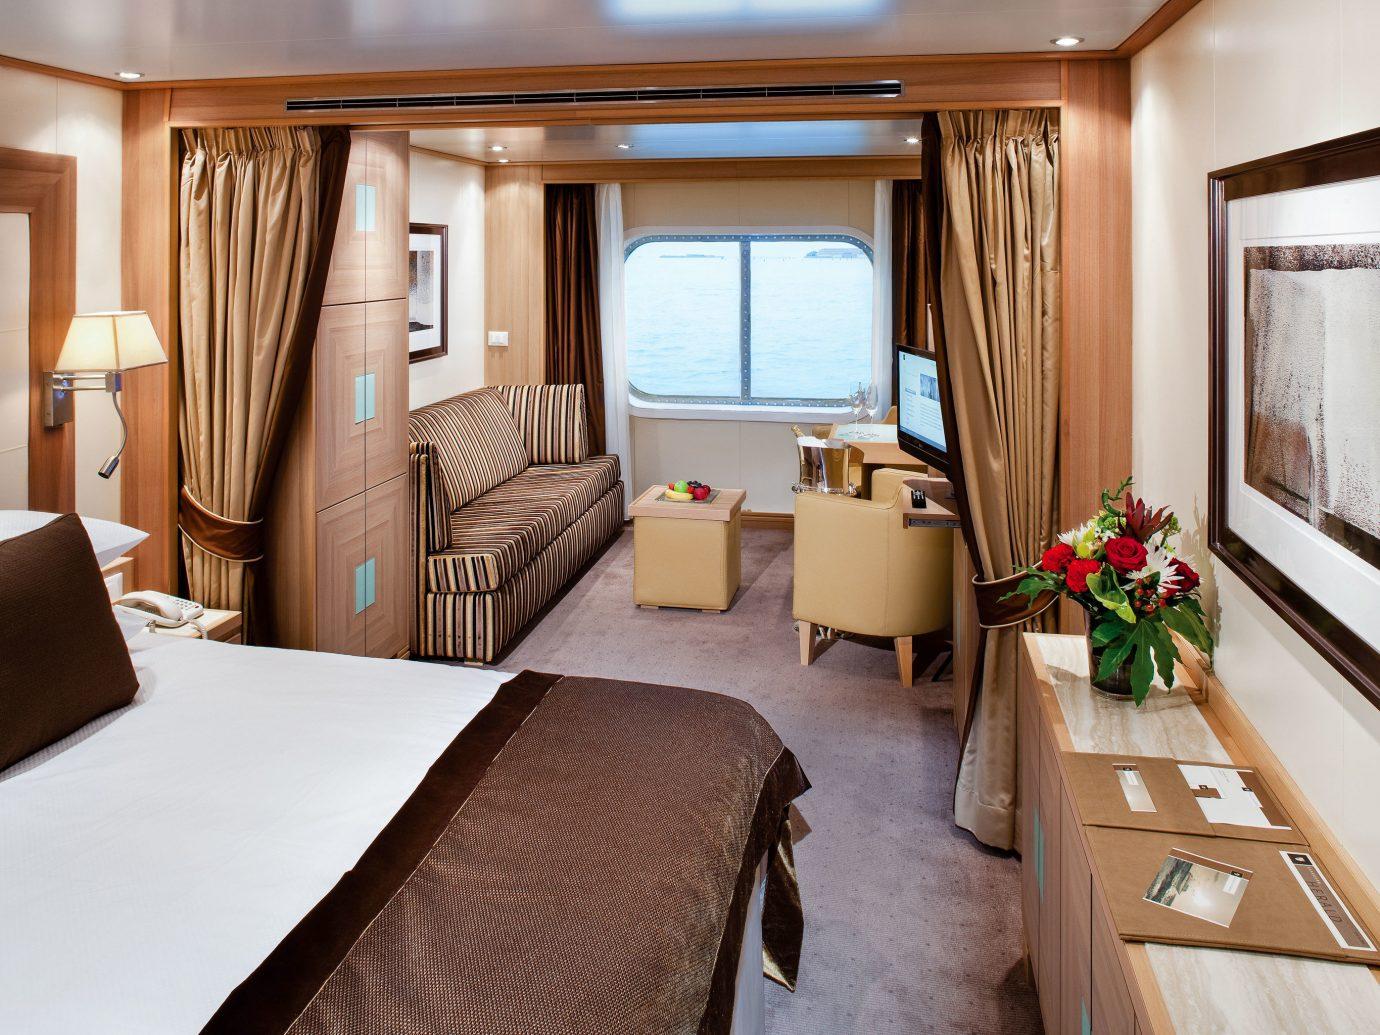 Cruise Travel Luxury Travel Trip Ideas indoor wall room floor window bed ceiling hotel Suite interior design Cabin furniture Bedroom decorated